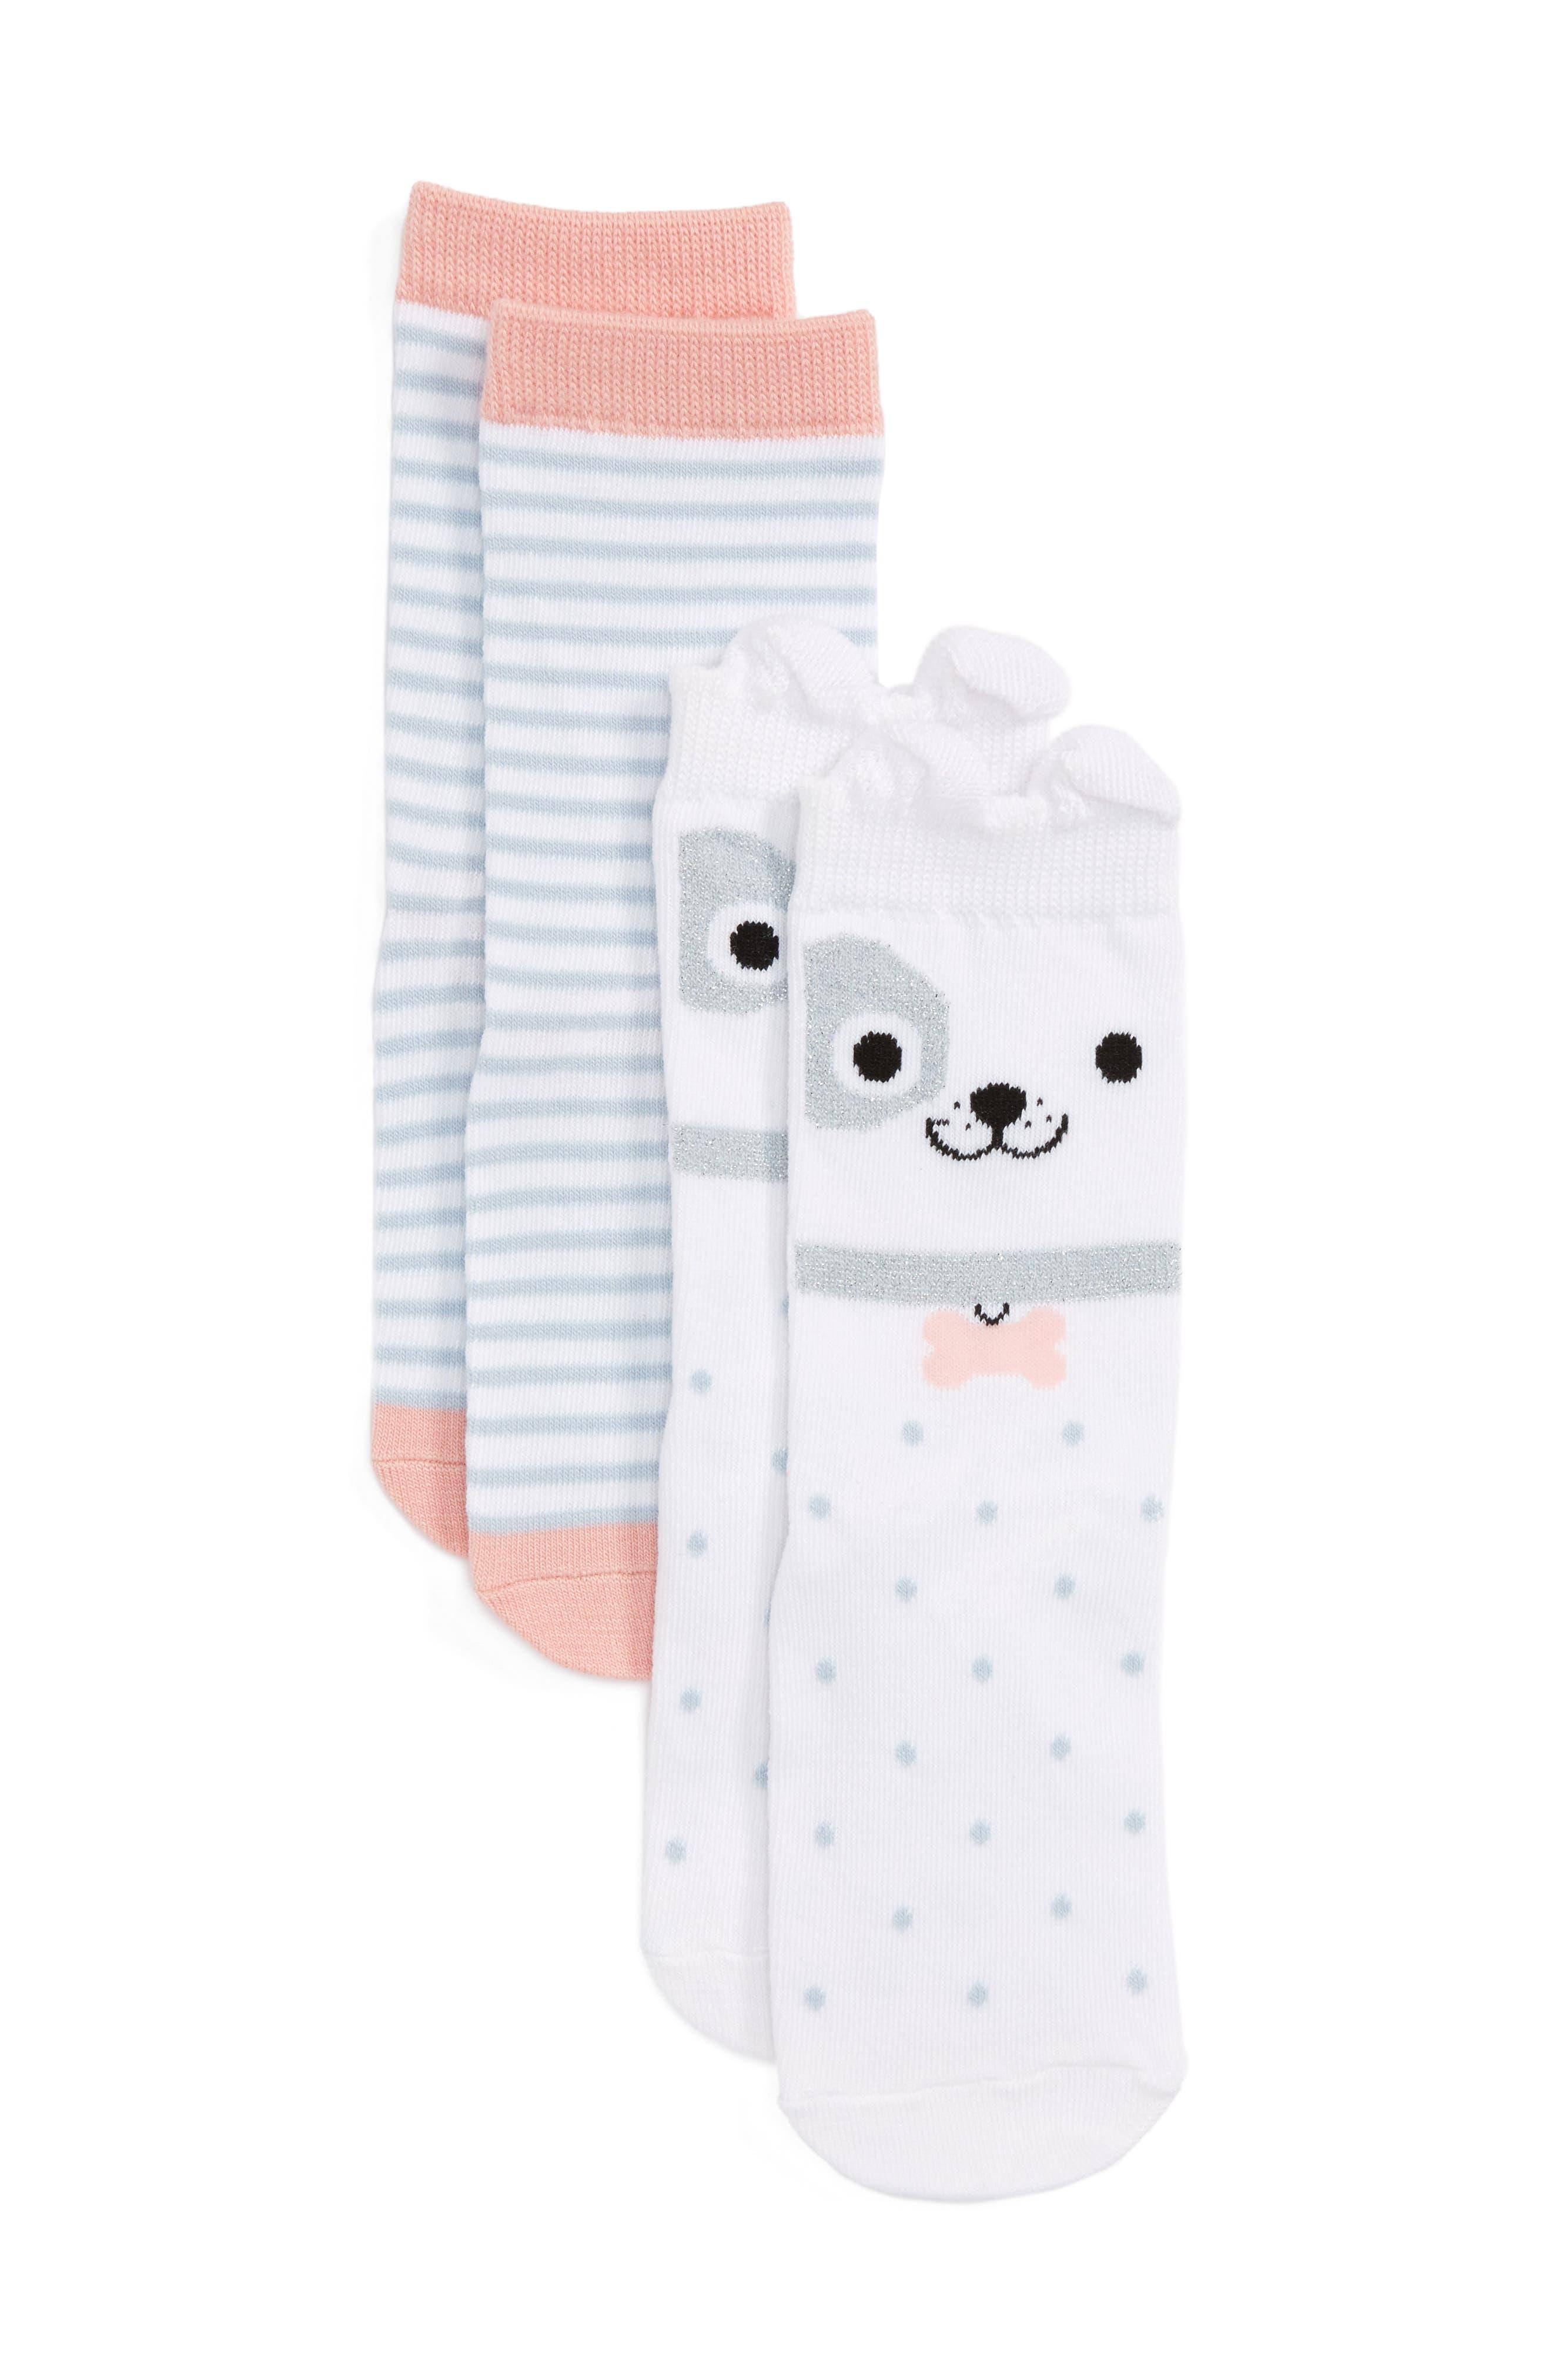 Tucker + Tate Assorted 2-Pack Socks (Toddler, Little Kid & Big Kid)